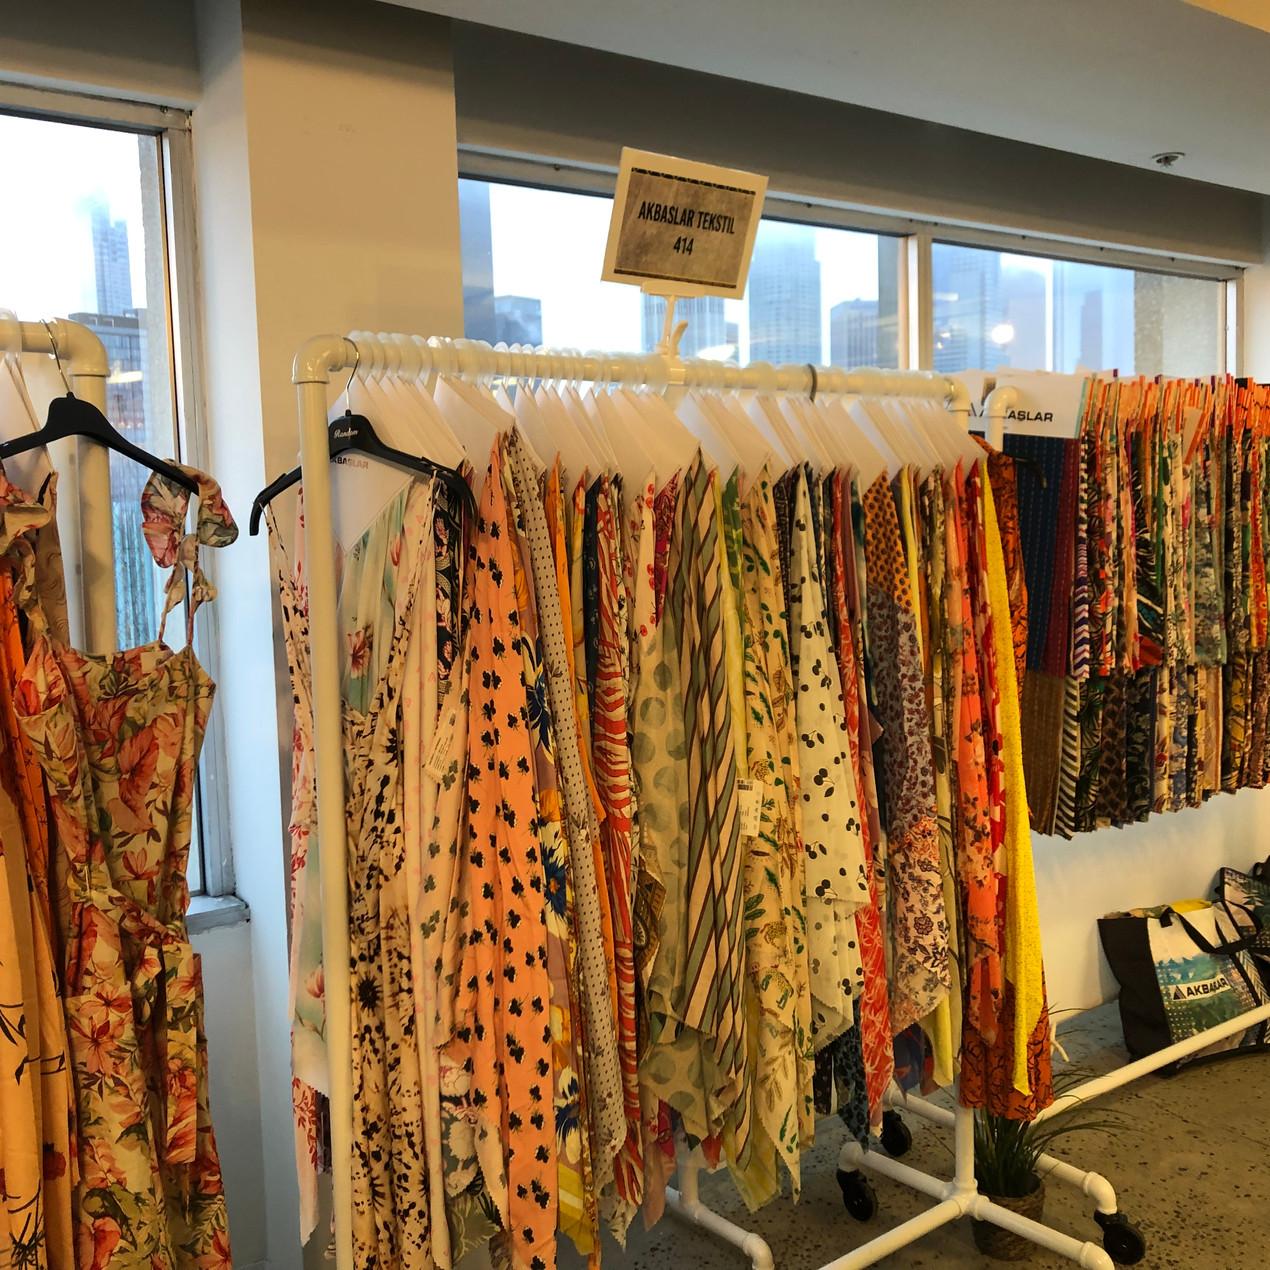 garment rack of fabrics and prints